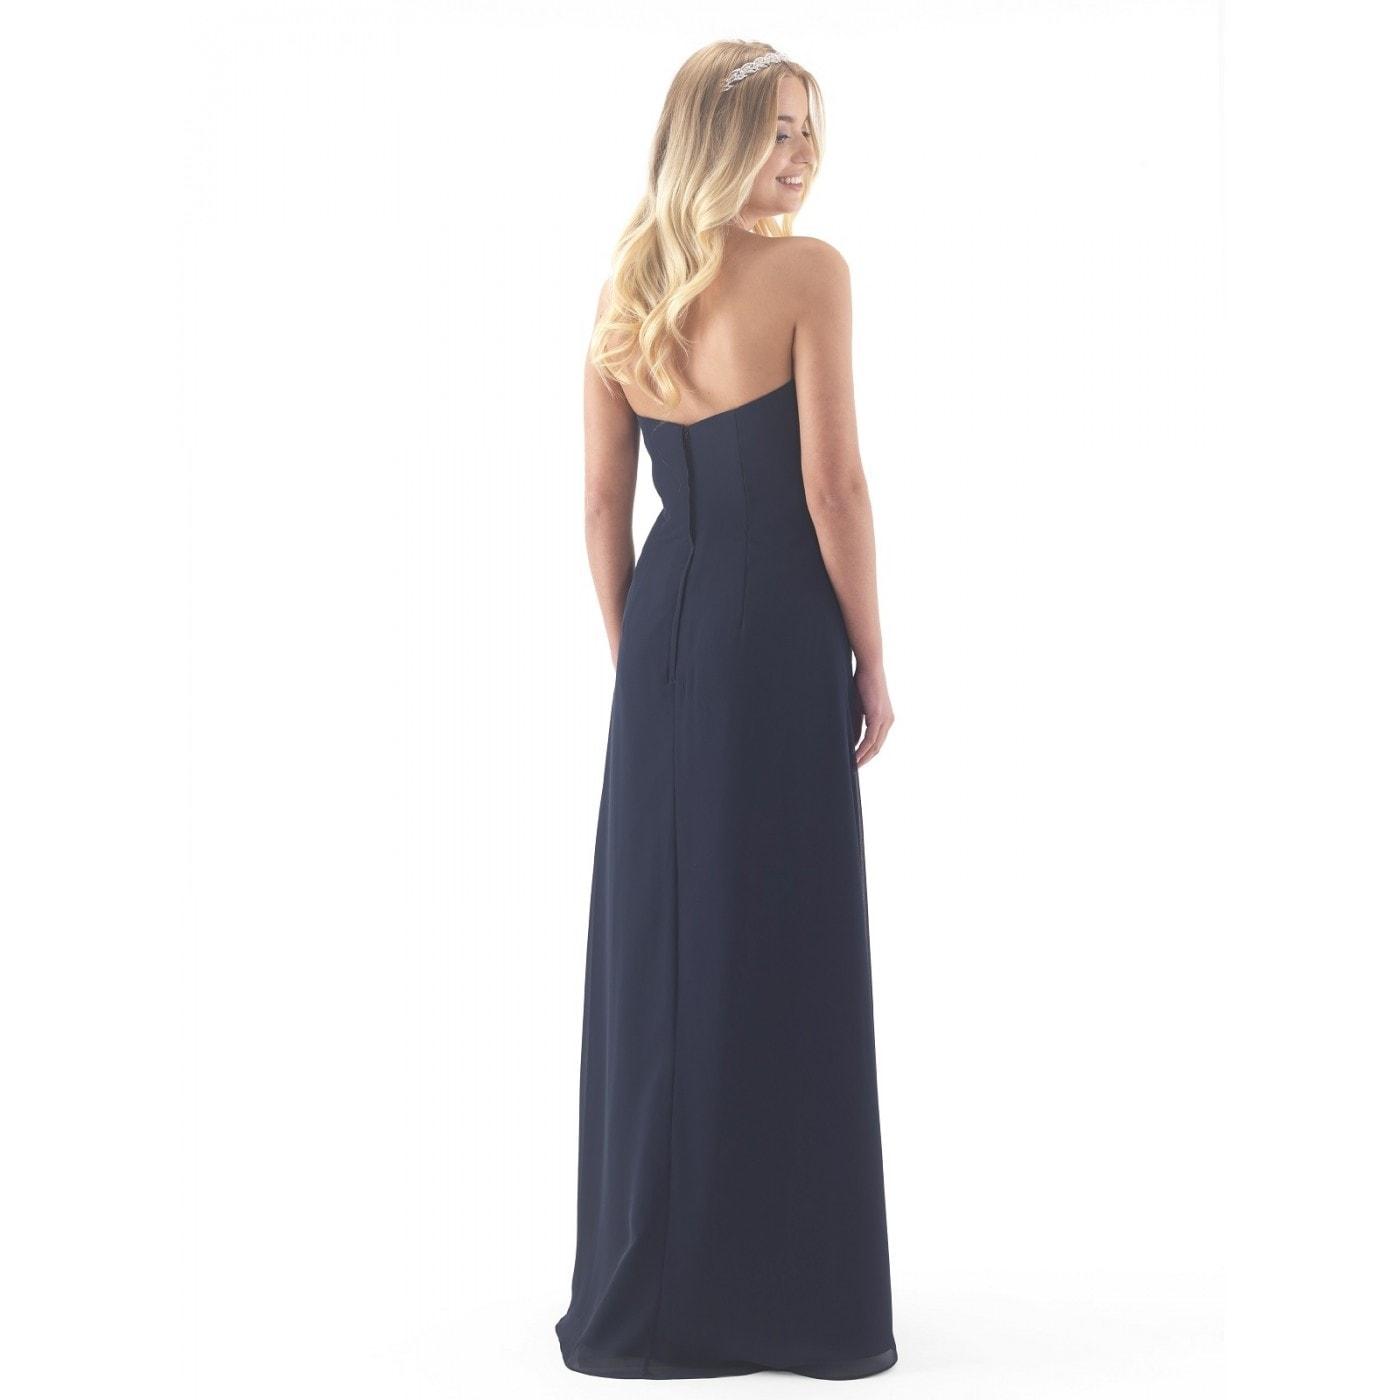 linzi-jay-empire-line-chiffon-bridesmaid-dress-en388-back-1400x1400